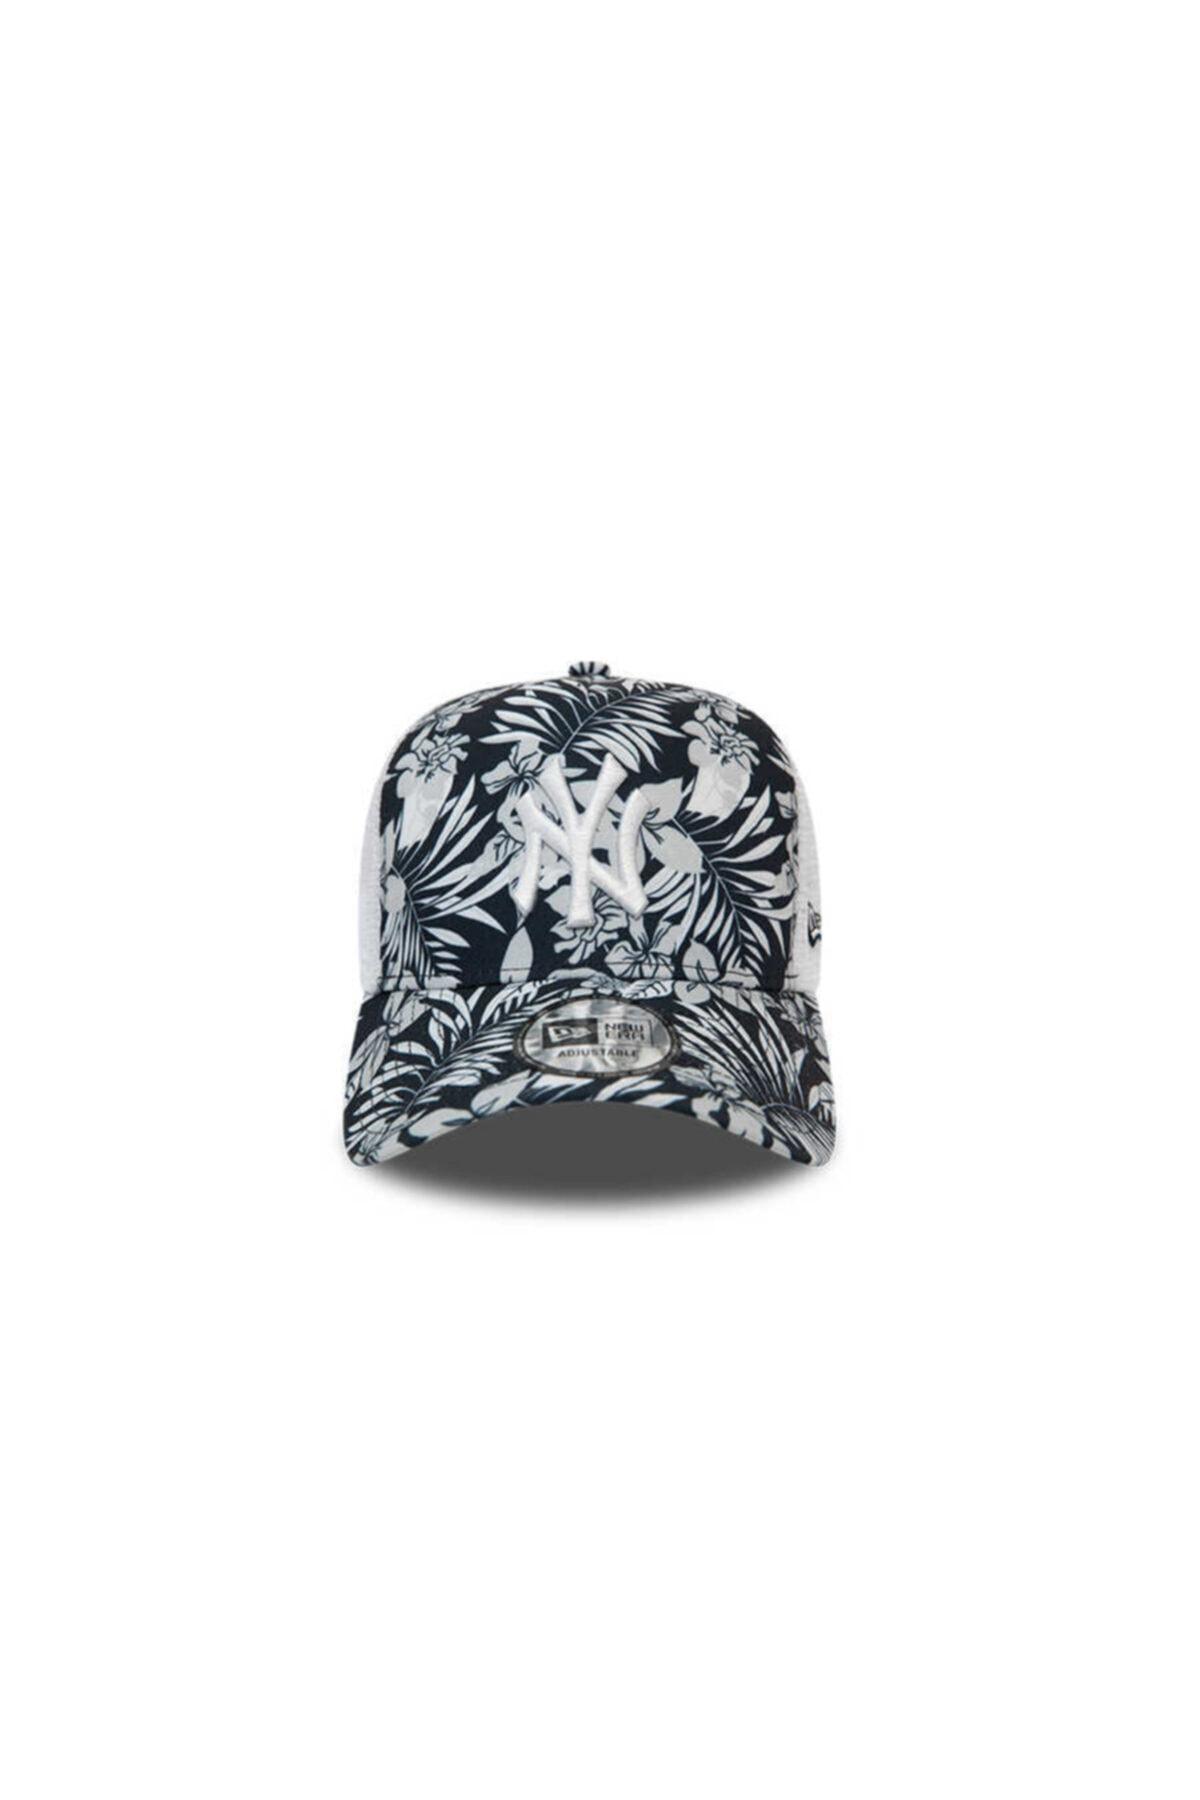 کلاه  برند NEW ERA رنگ لاجوردی کد ty81326991